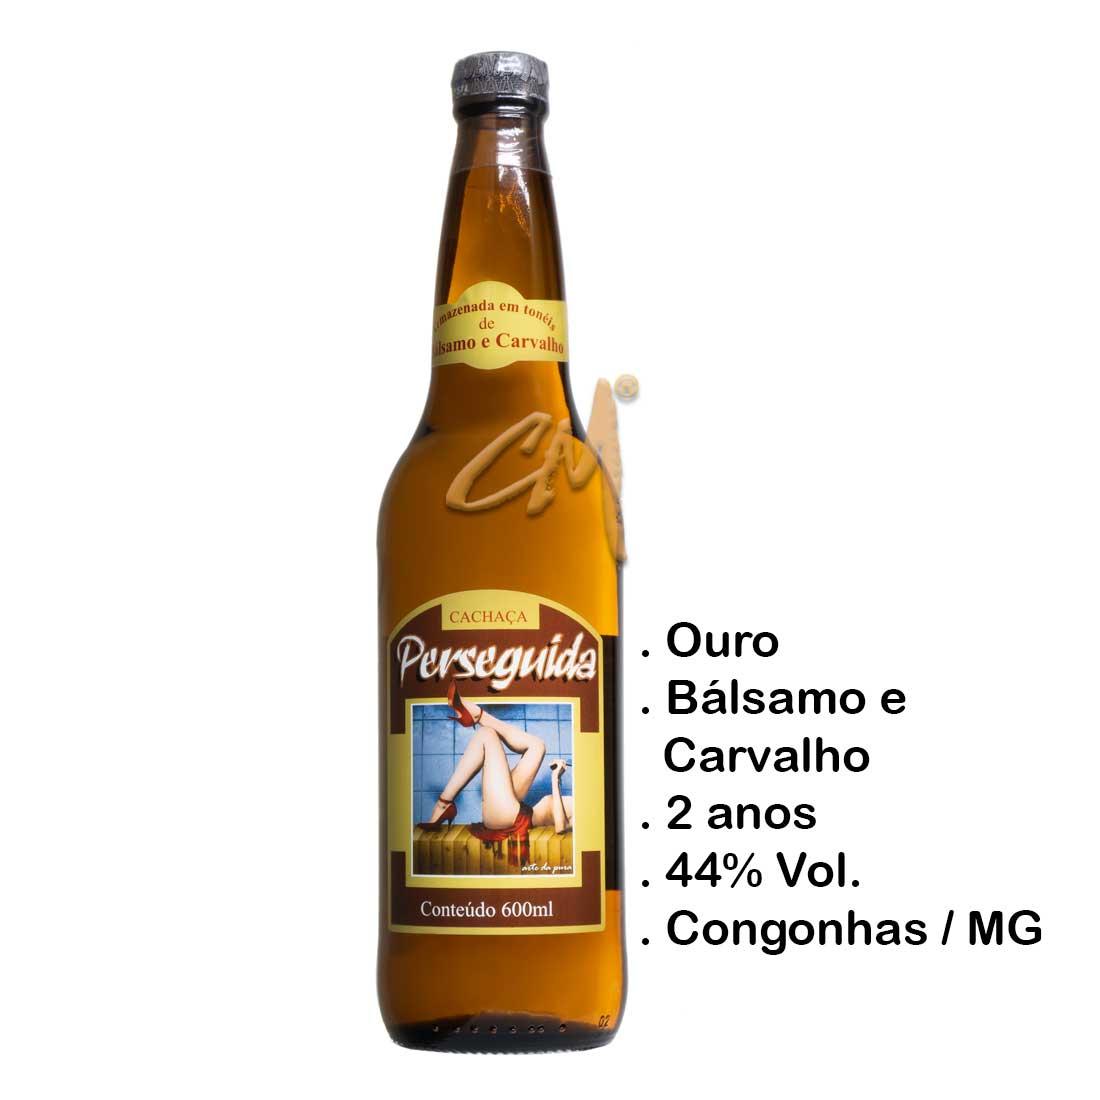 Cachaça Perseguida Ouro 600 ml (Congonhas - MG)